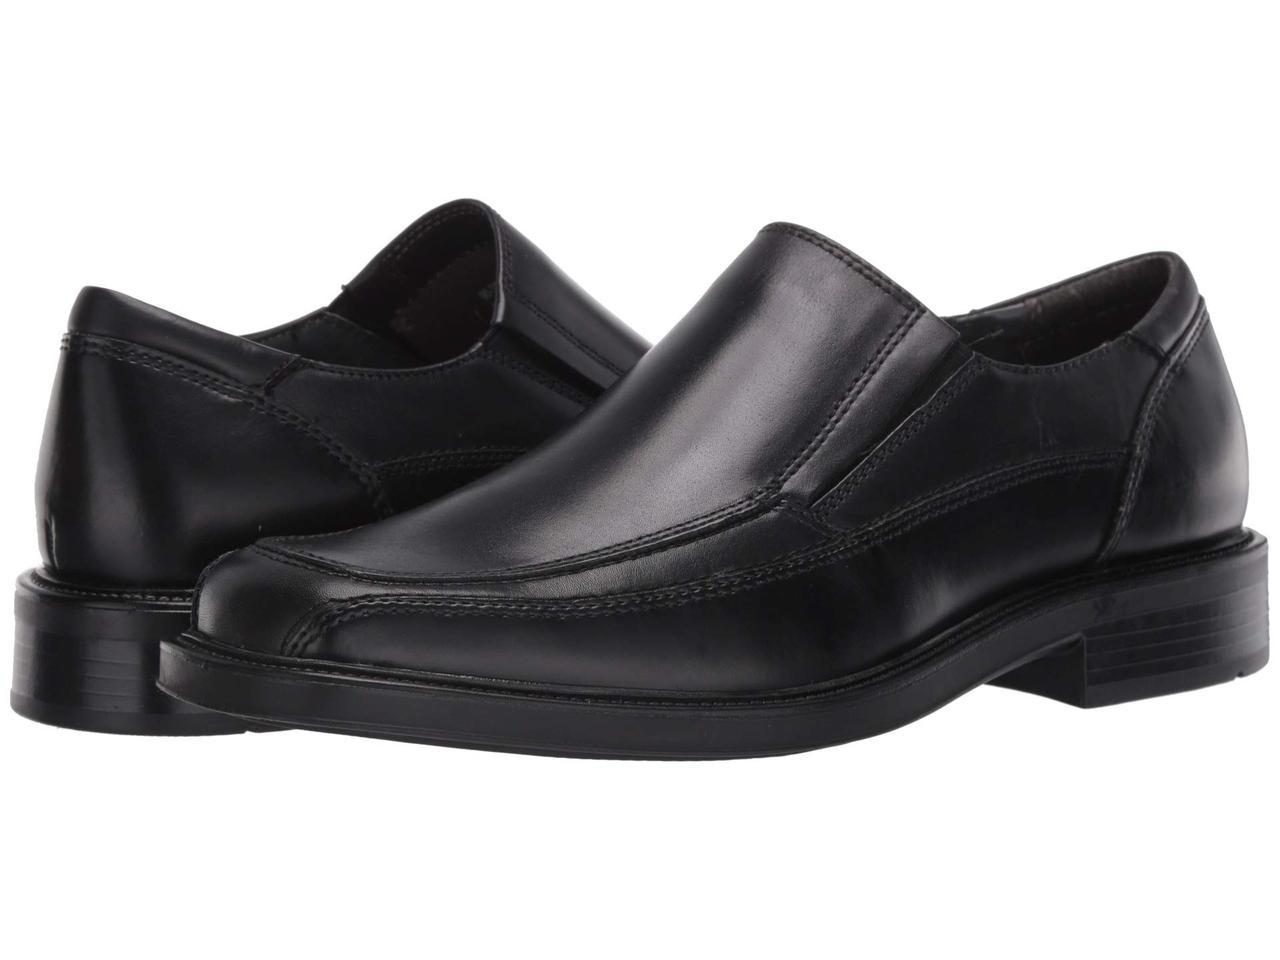 Мокасины (Оригинал) Dockers Proposal Moc Toe Loafer Black